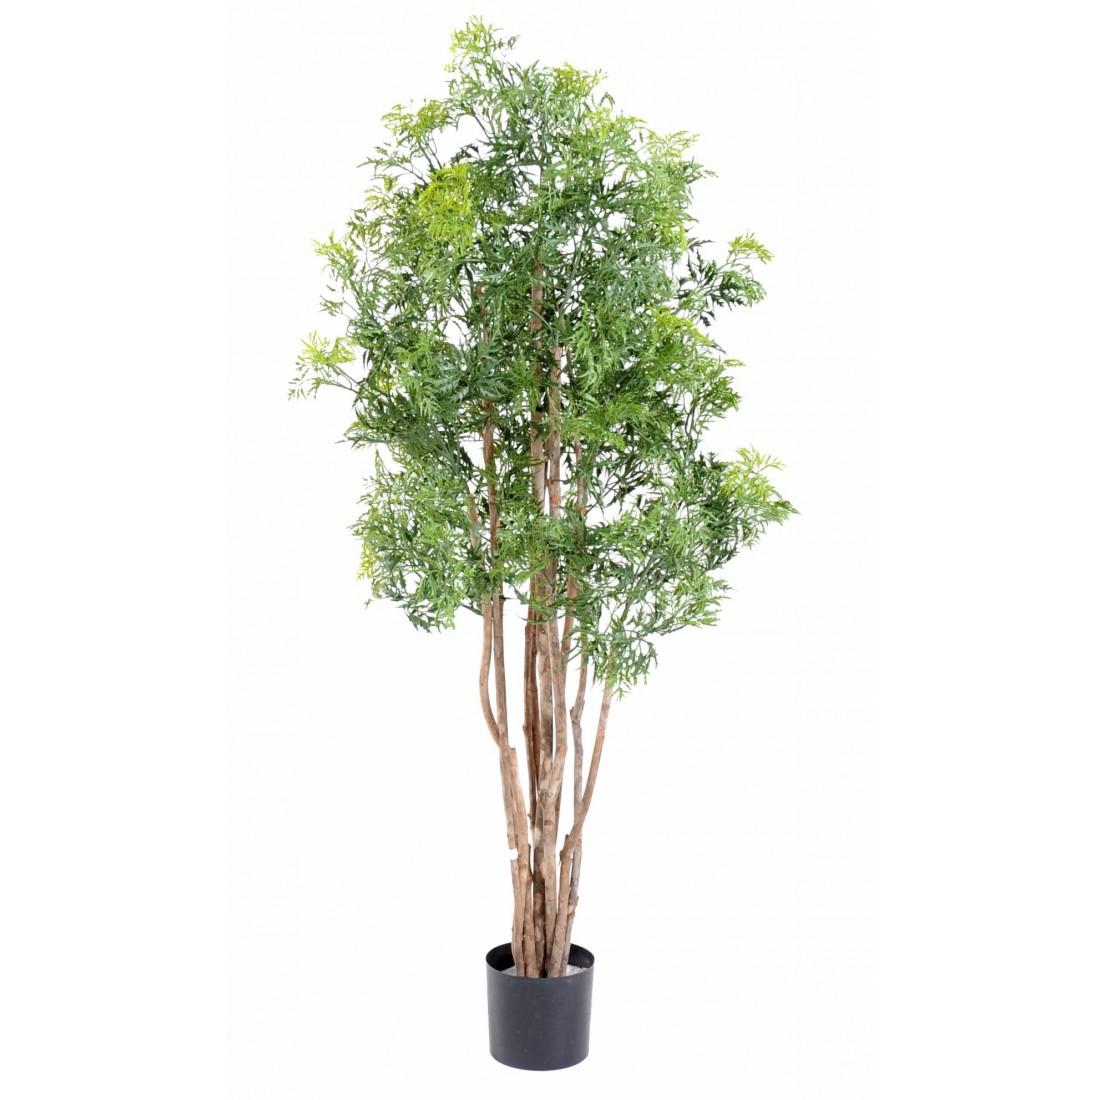 aralia artificiel ming nitida 150 et 180 cm autres arbres reflets nature lyon. Black Bedroom Furniture Sets. Home Design Ideas